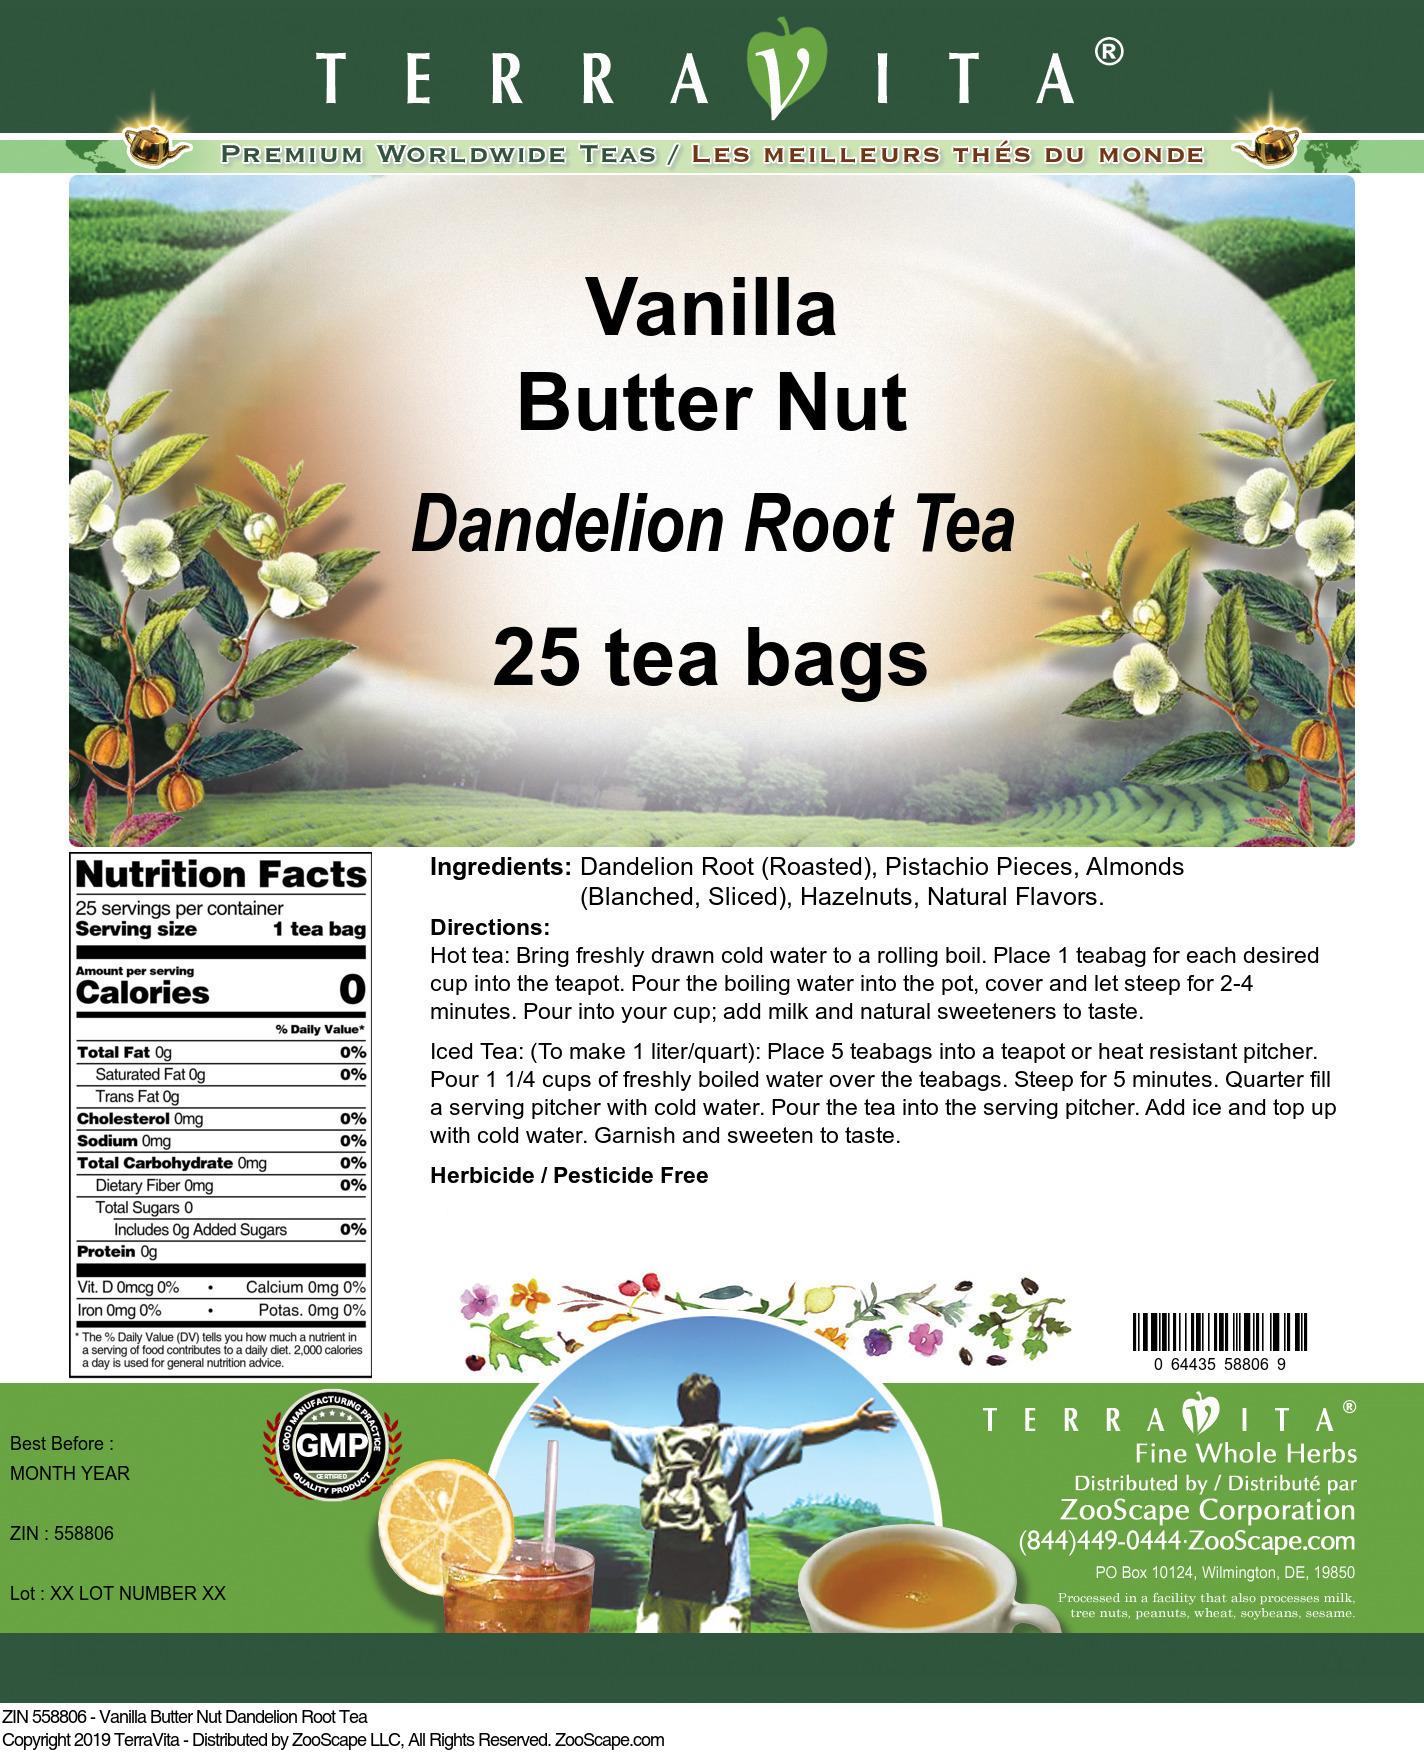 Vanilla Butter Nut Dandelion Root Tea